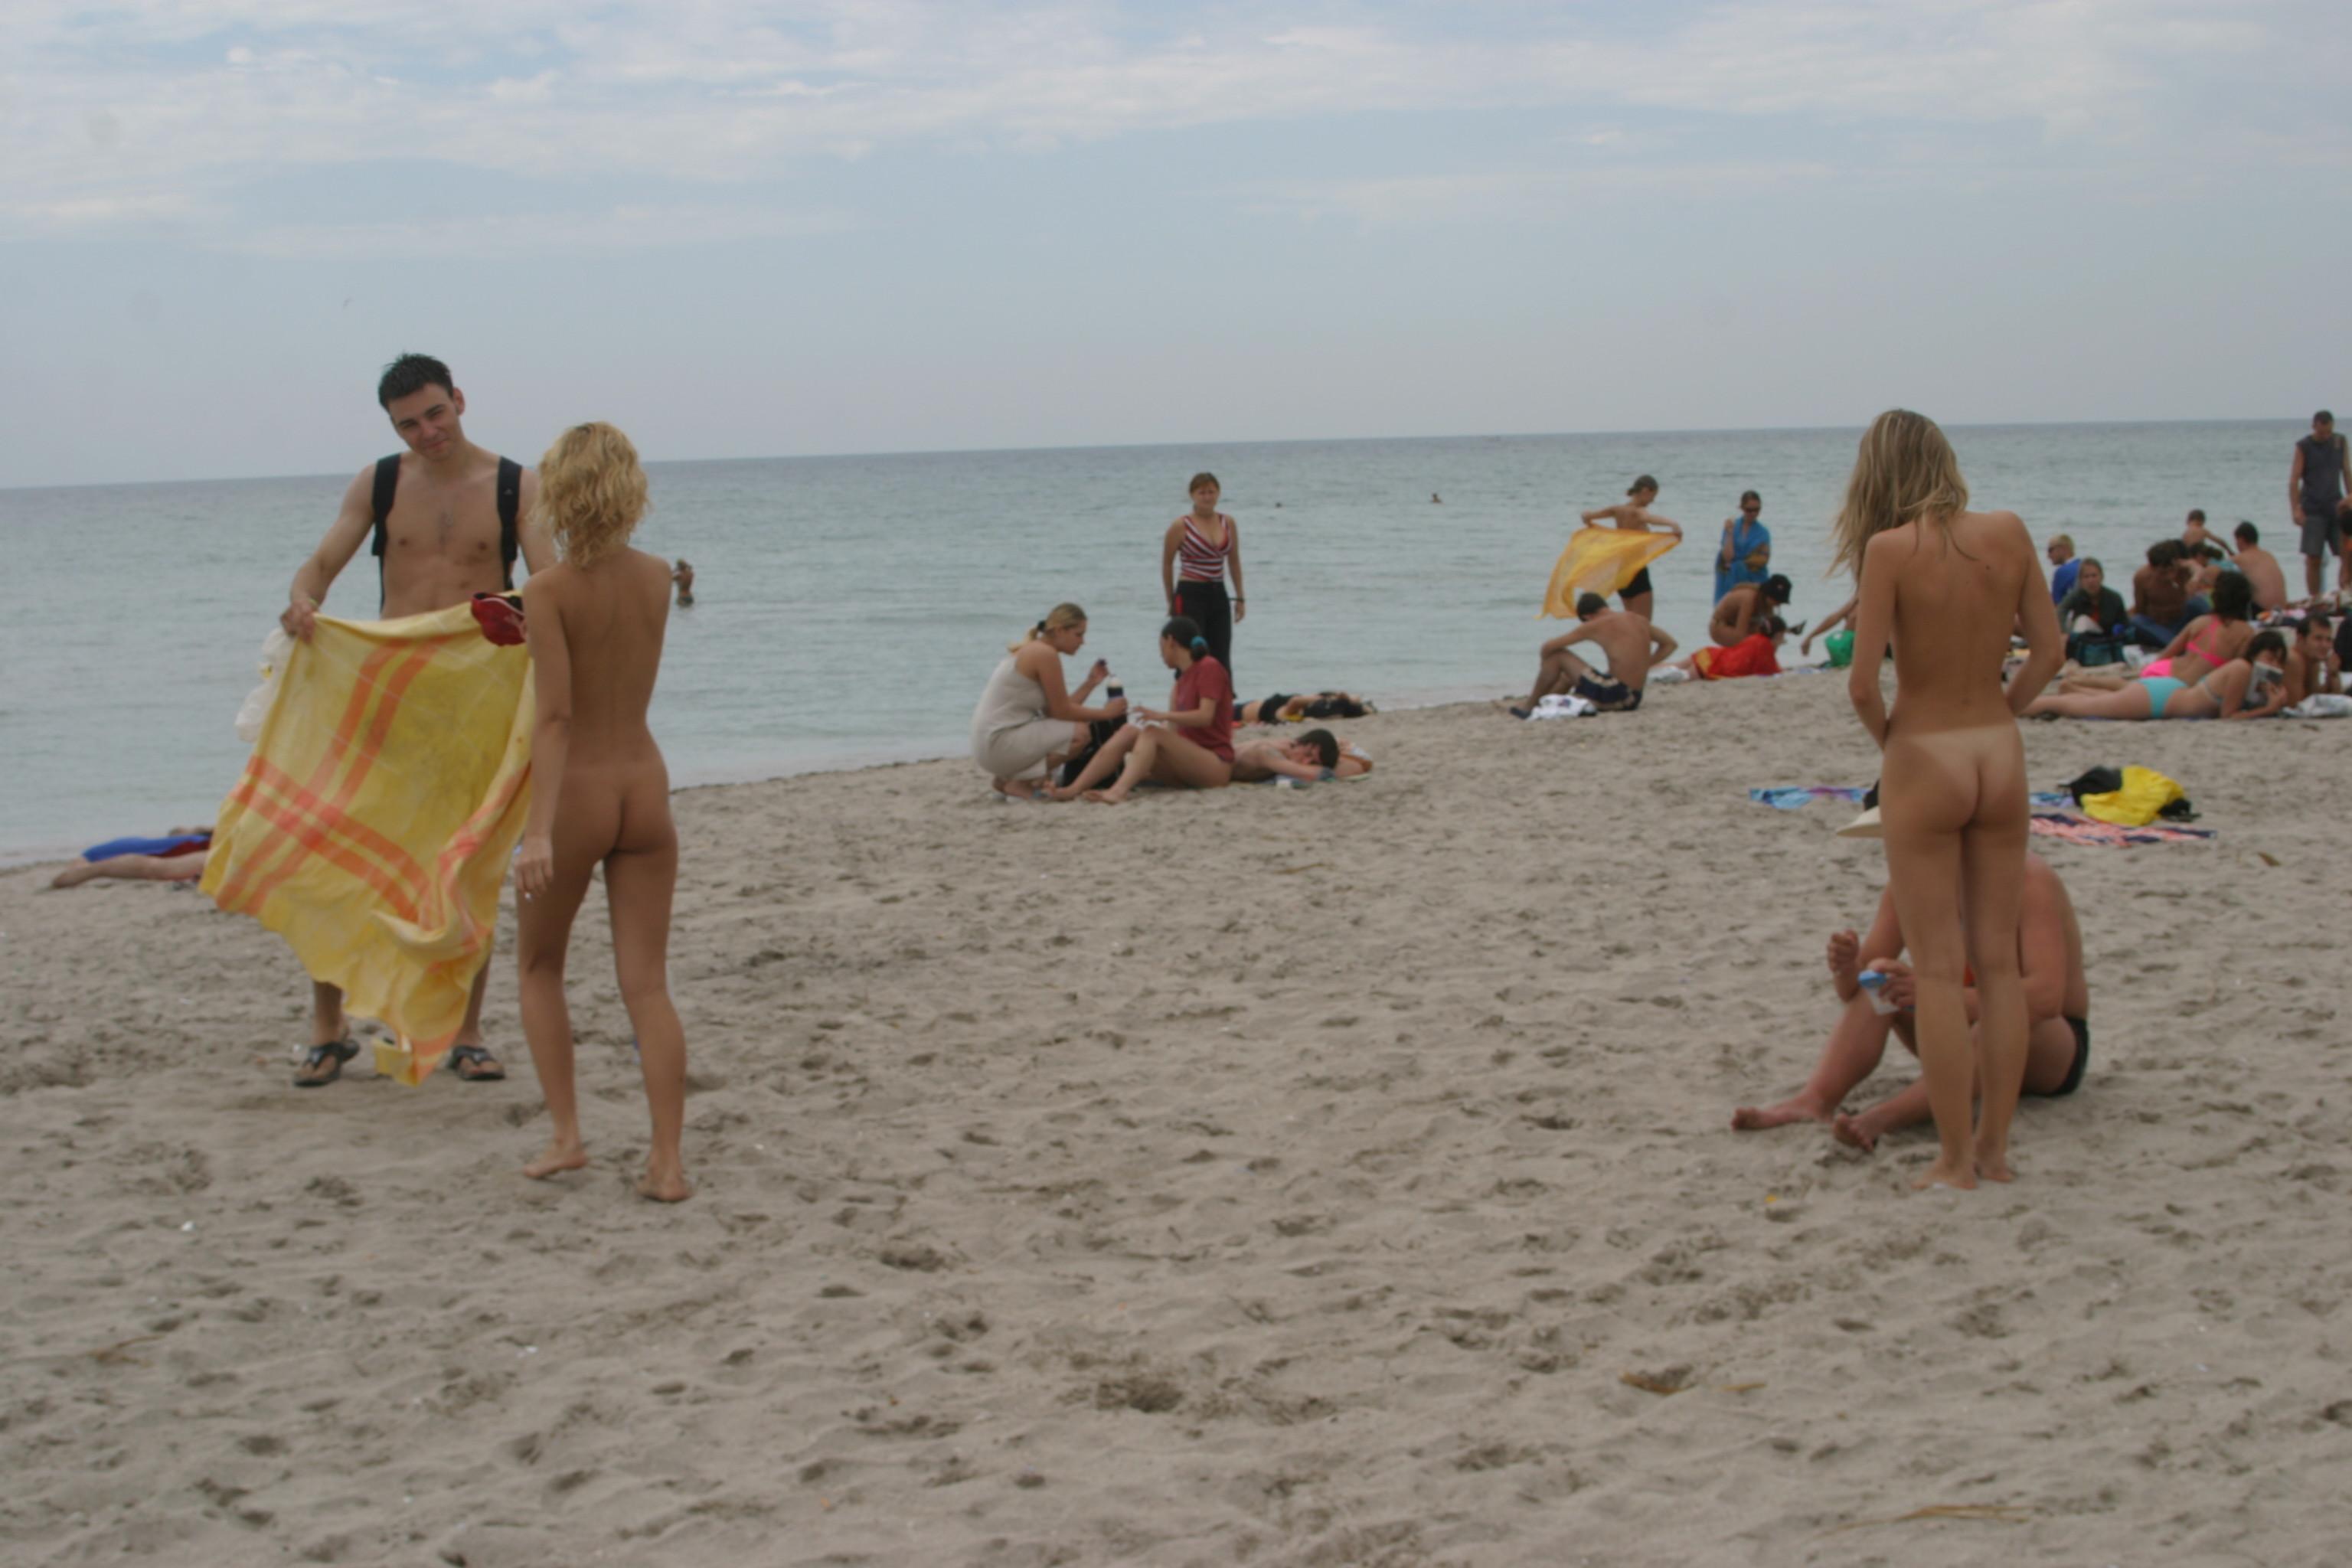 vika-y-lena-l-beach-nude-in-public-metart-24